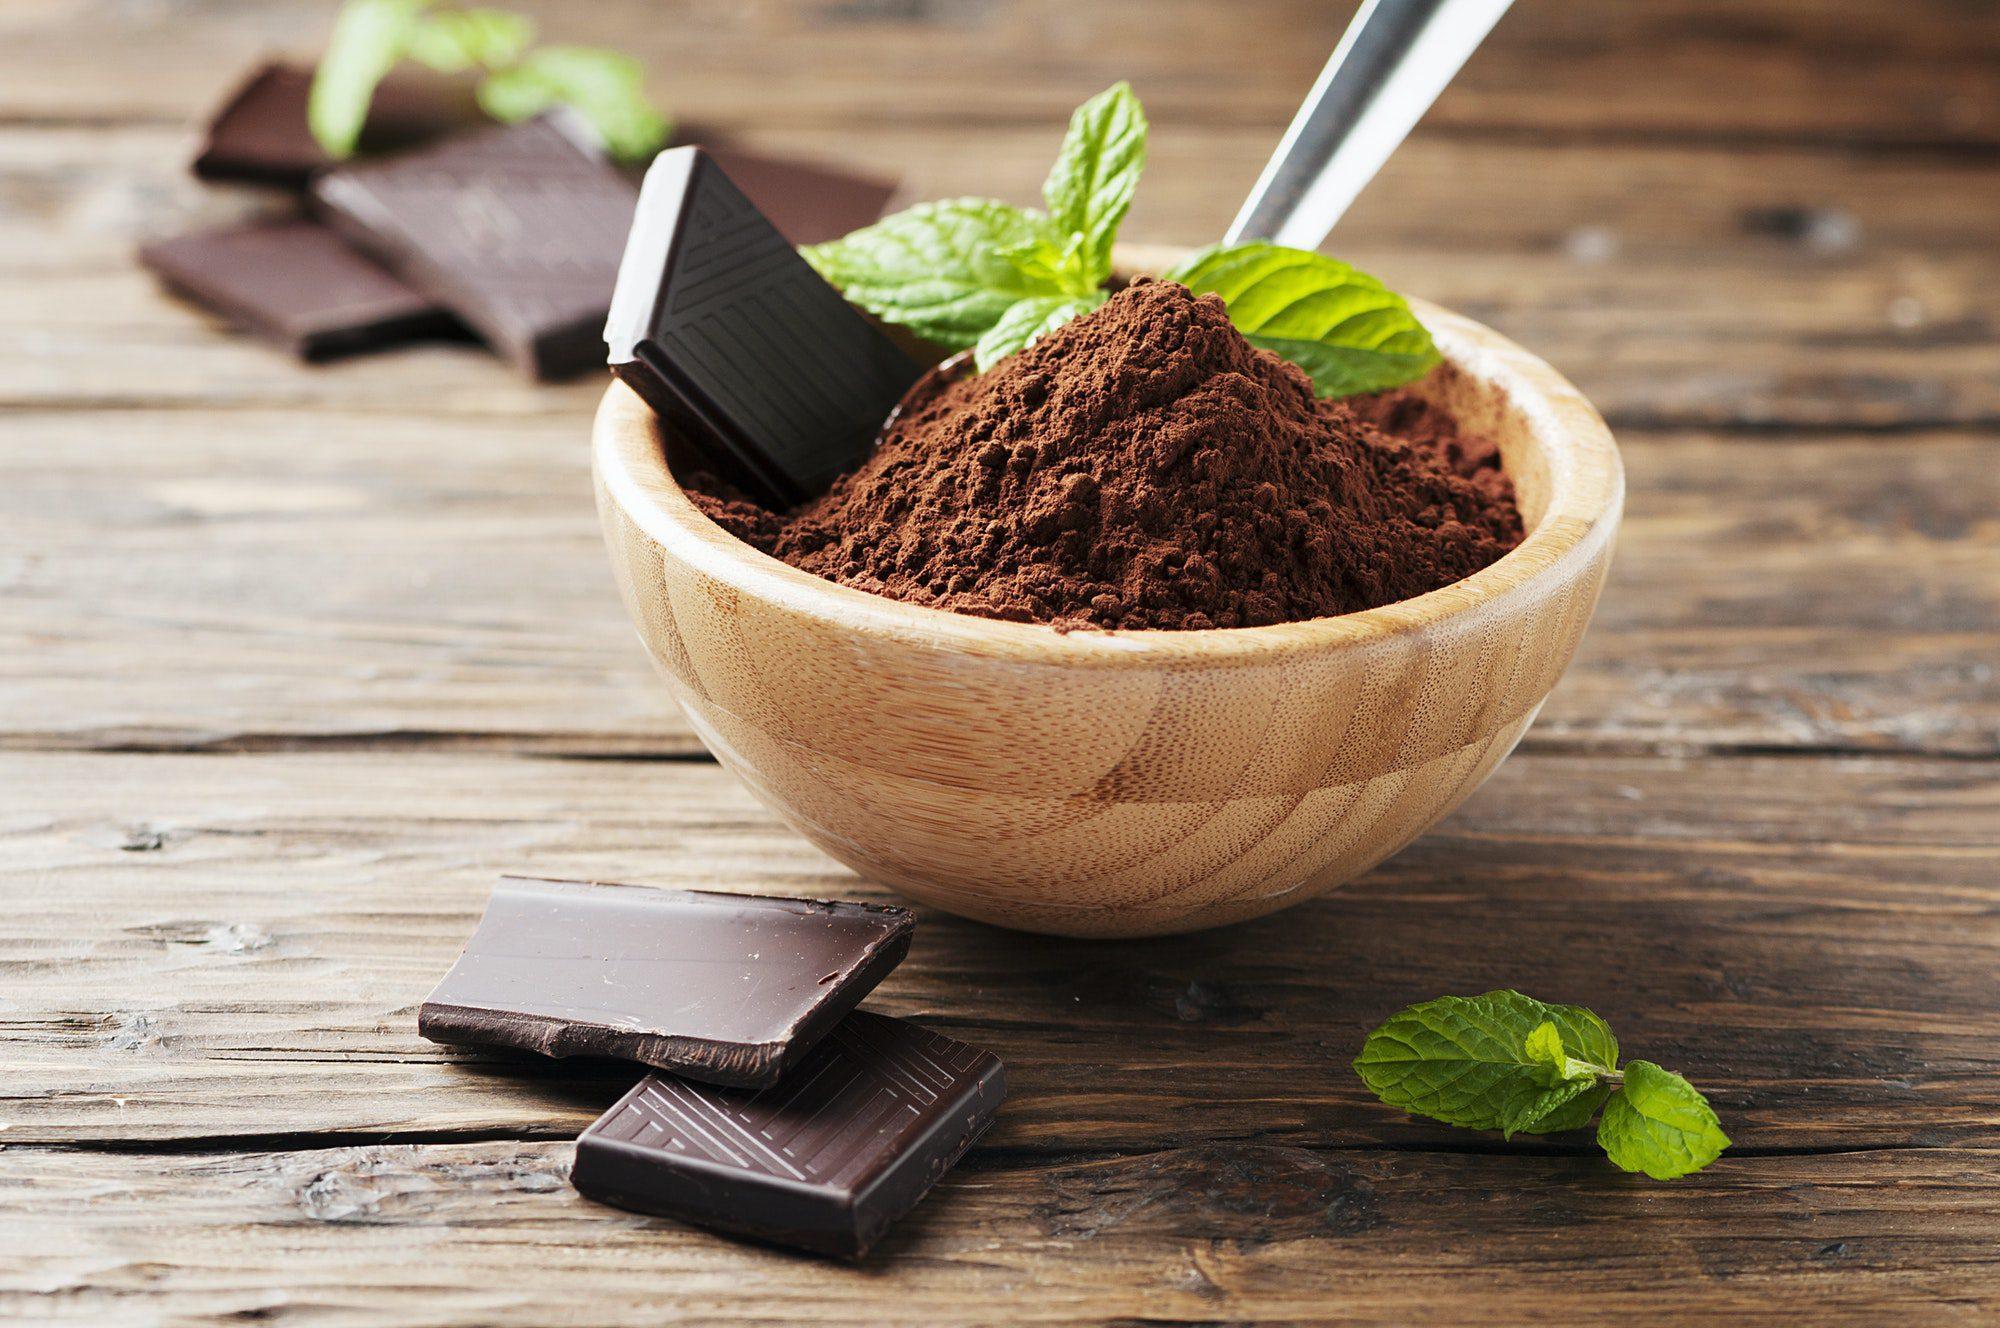 Microdosificación con cacao